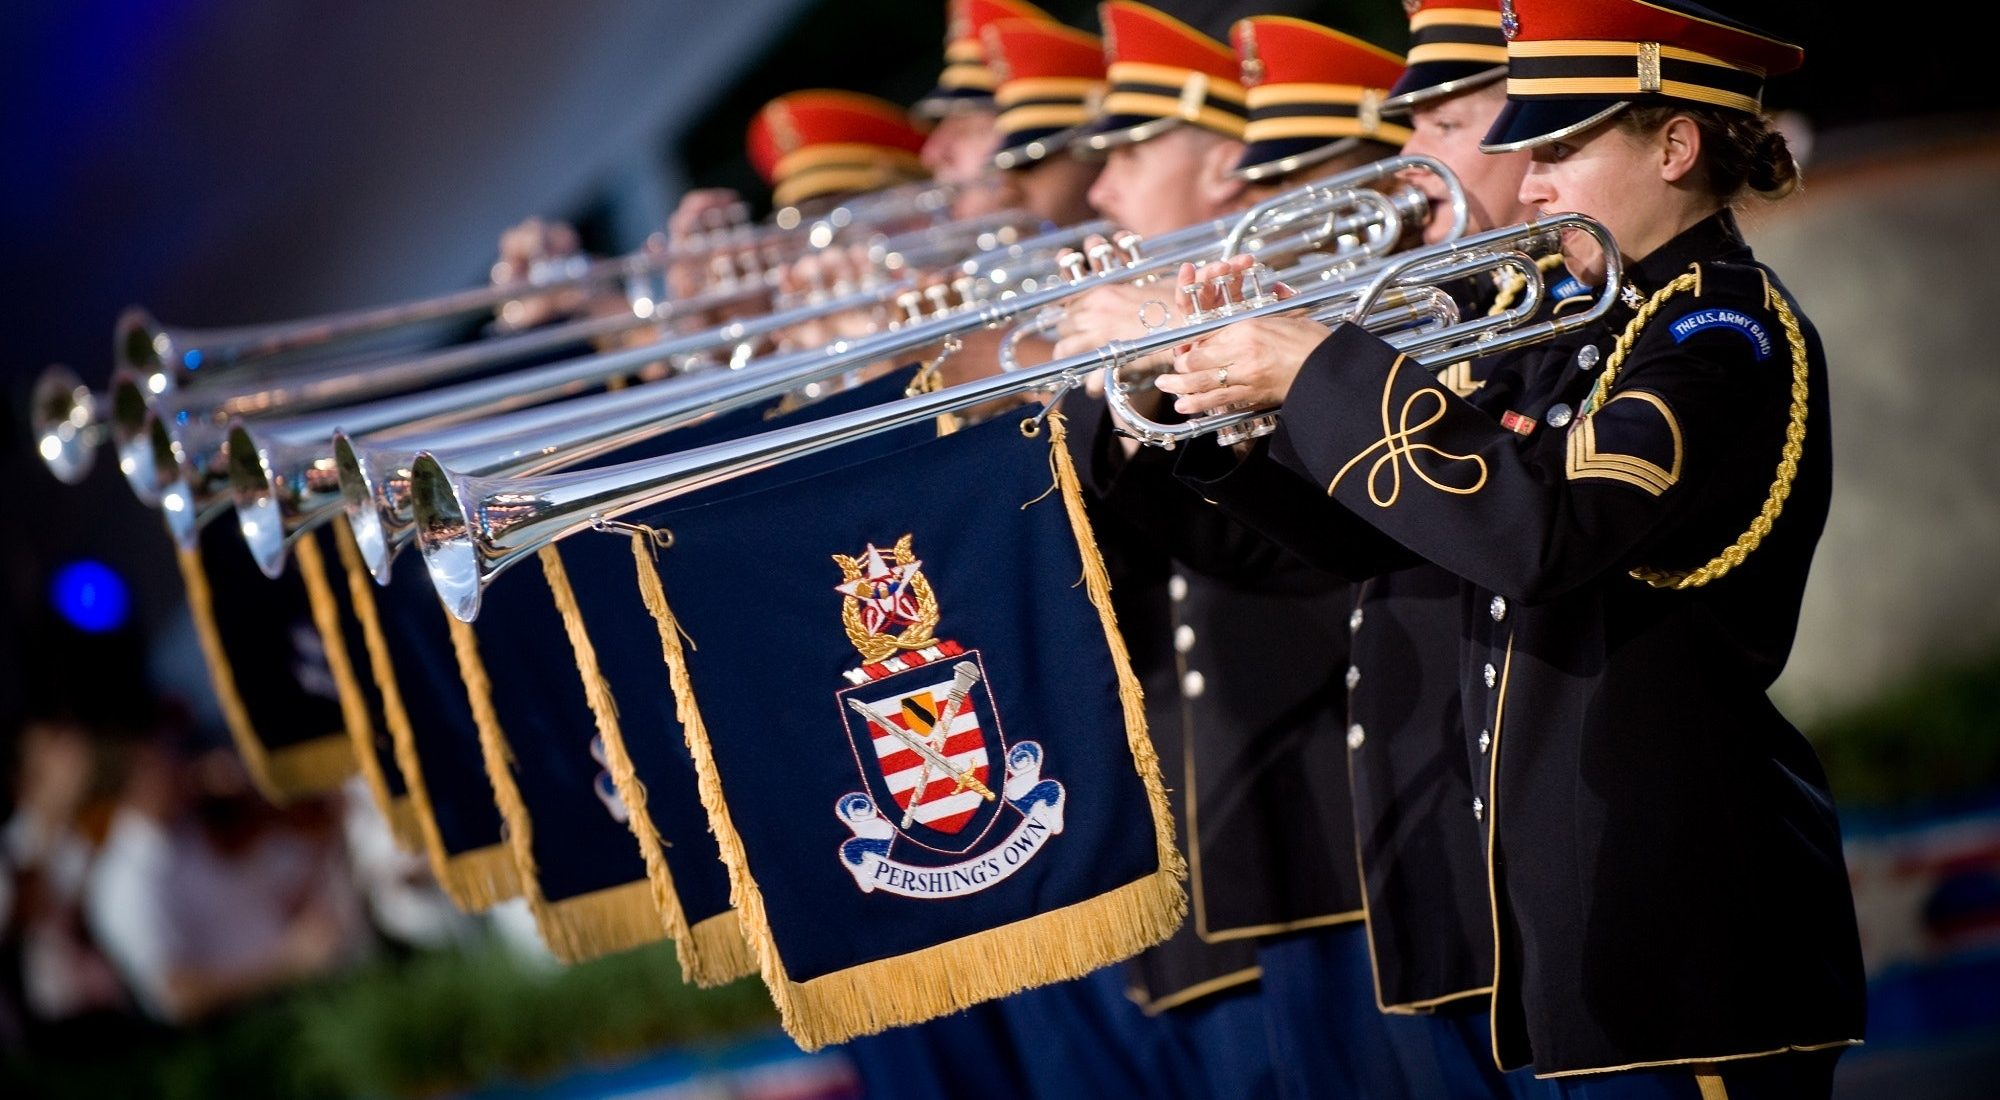 brassbandmuziek